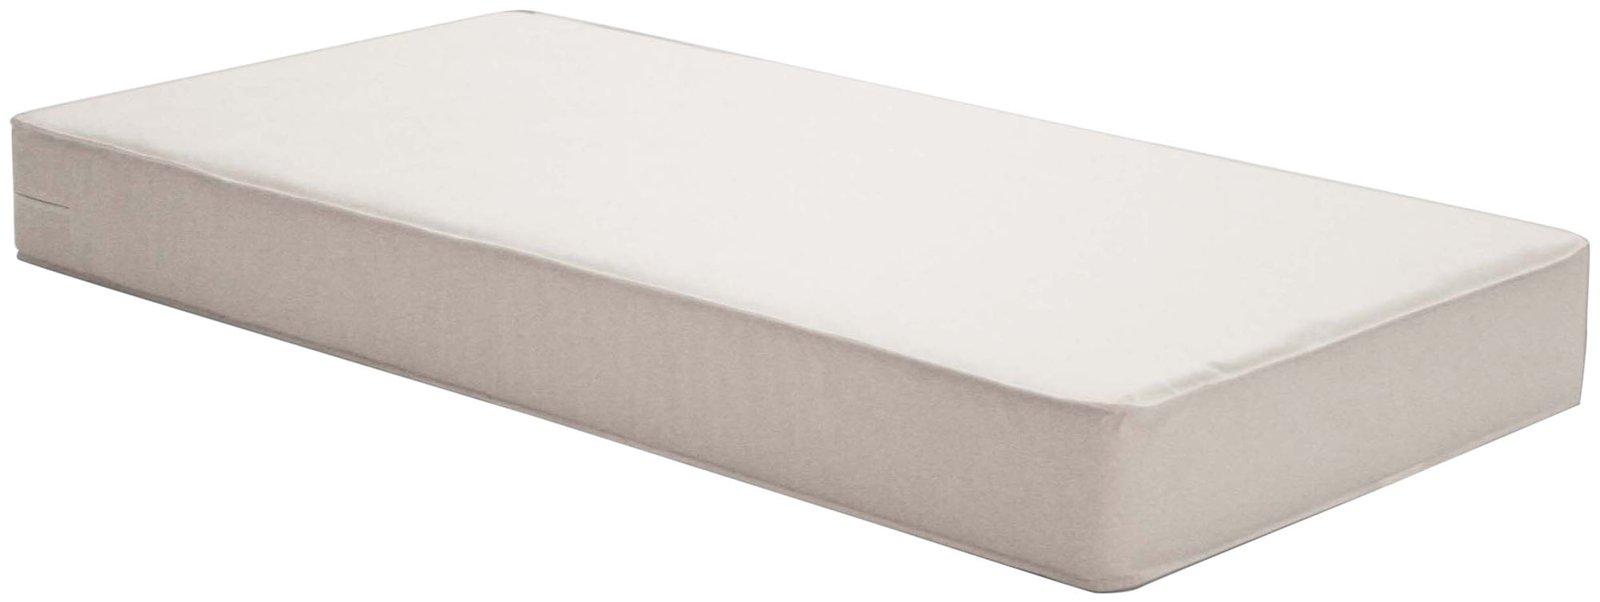 Top crib mattress 2